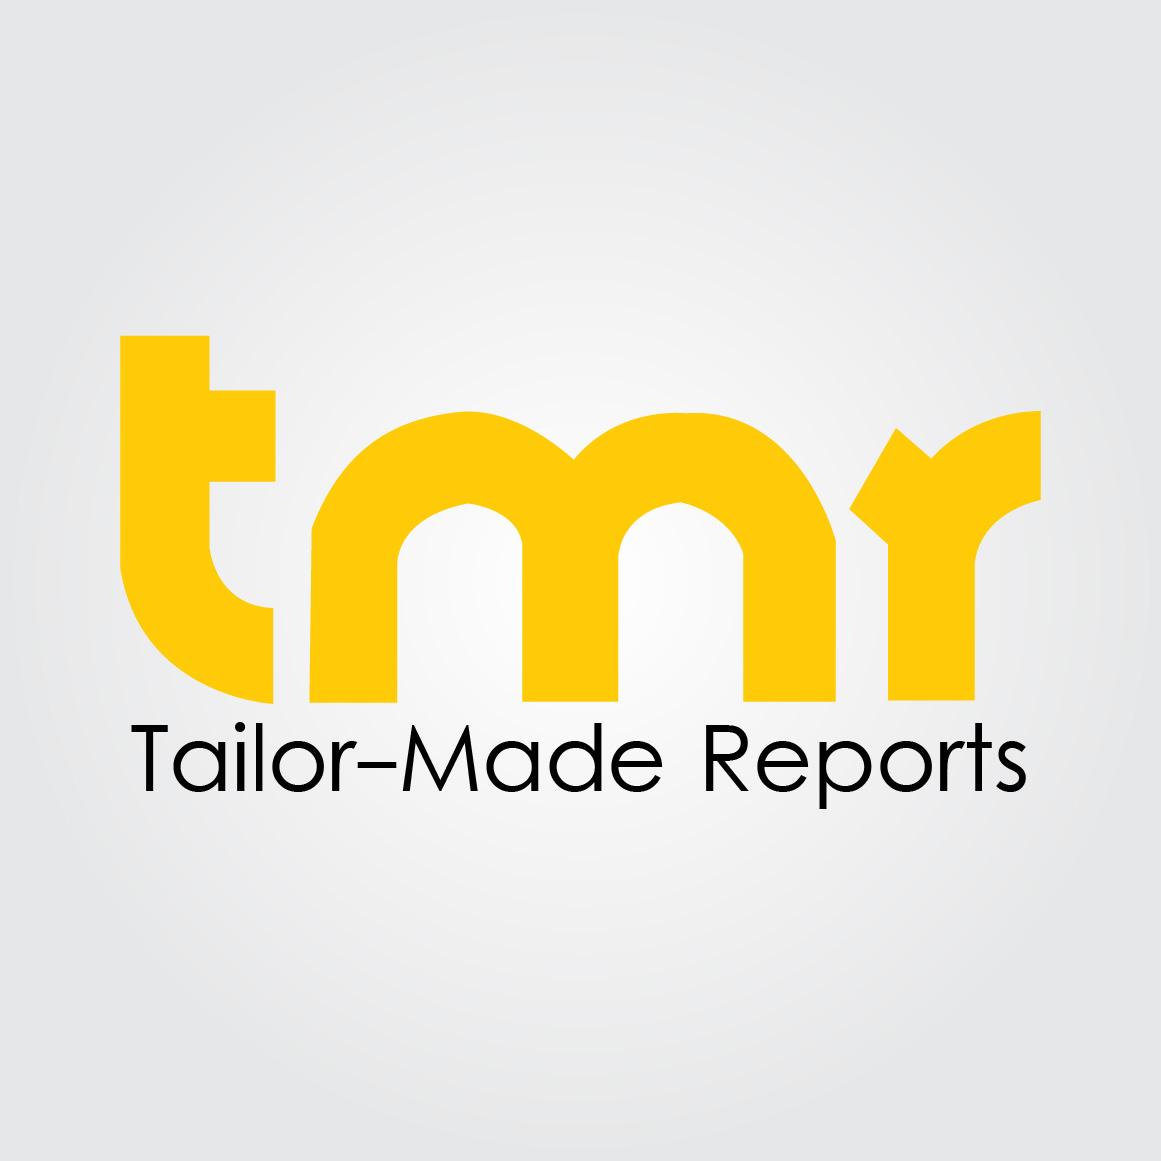 Scaffold Technology Market Survey Report | Latest Technological Developments Analysis